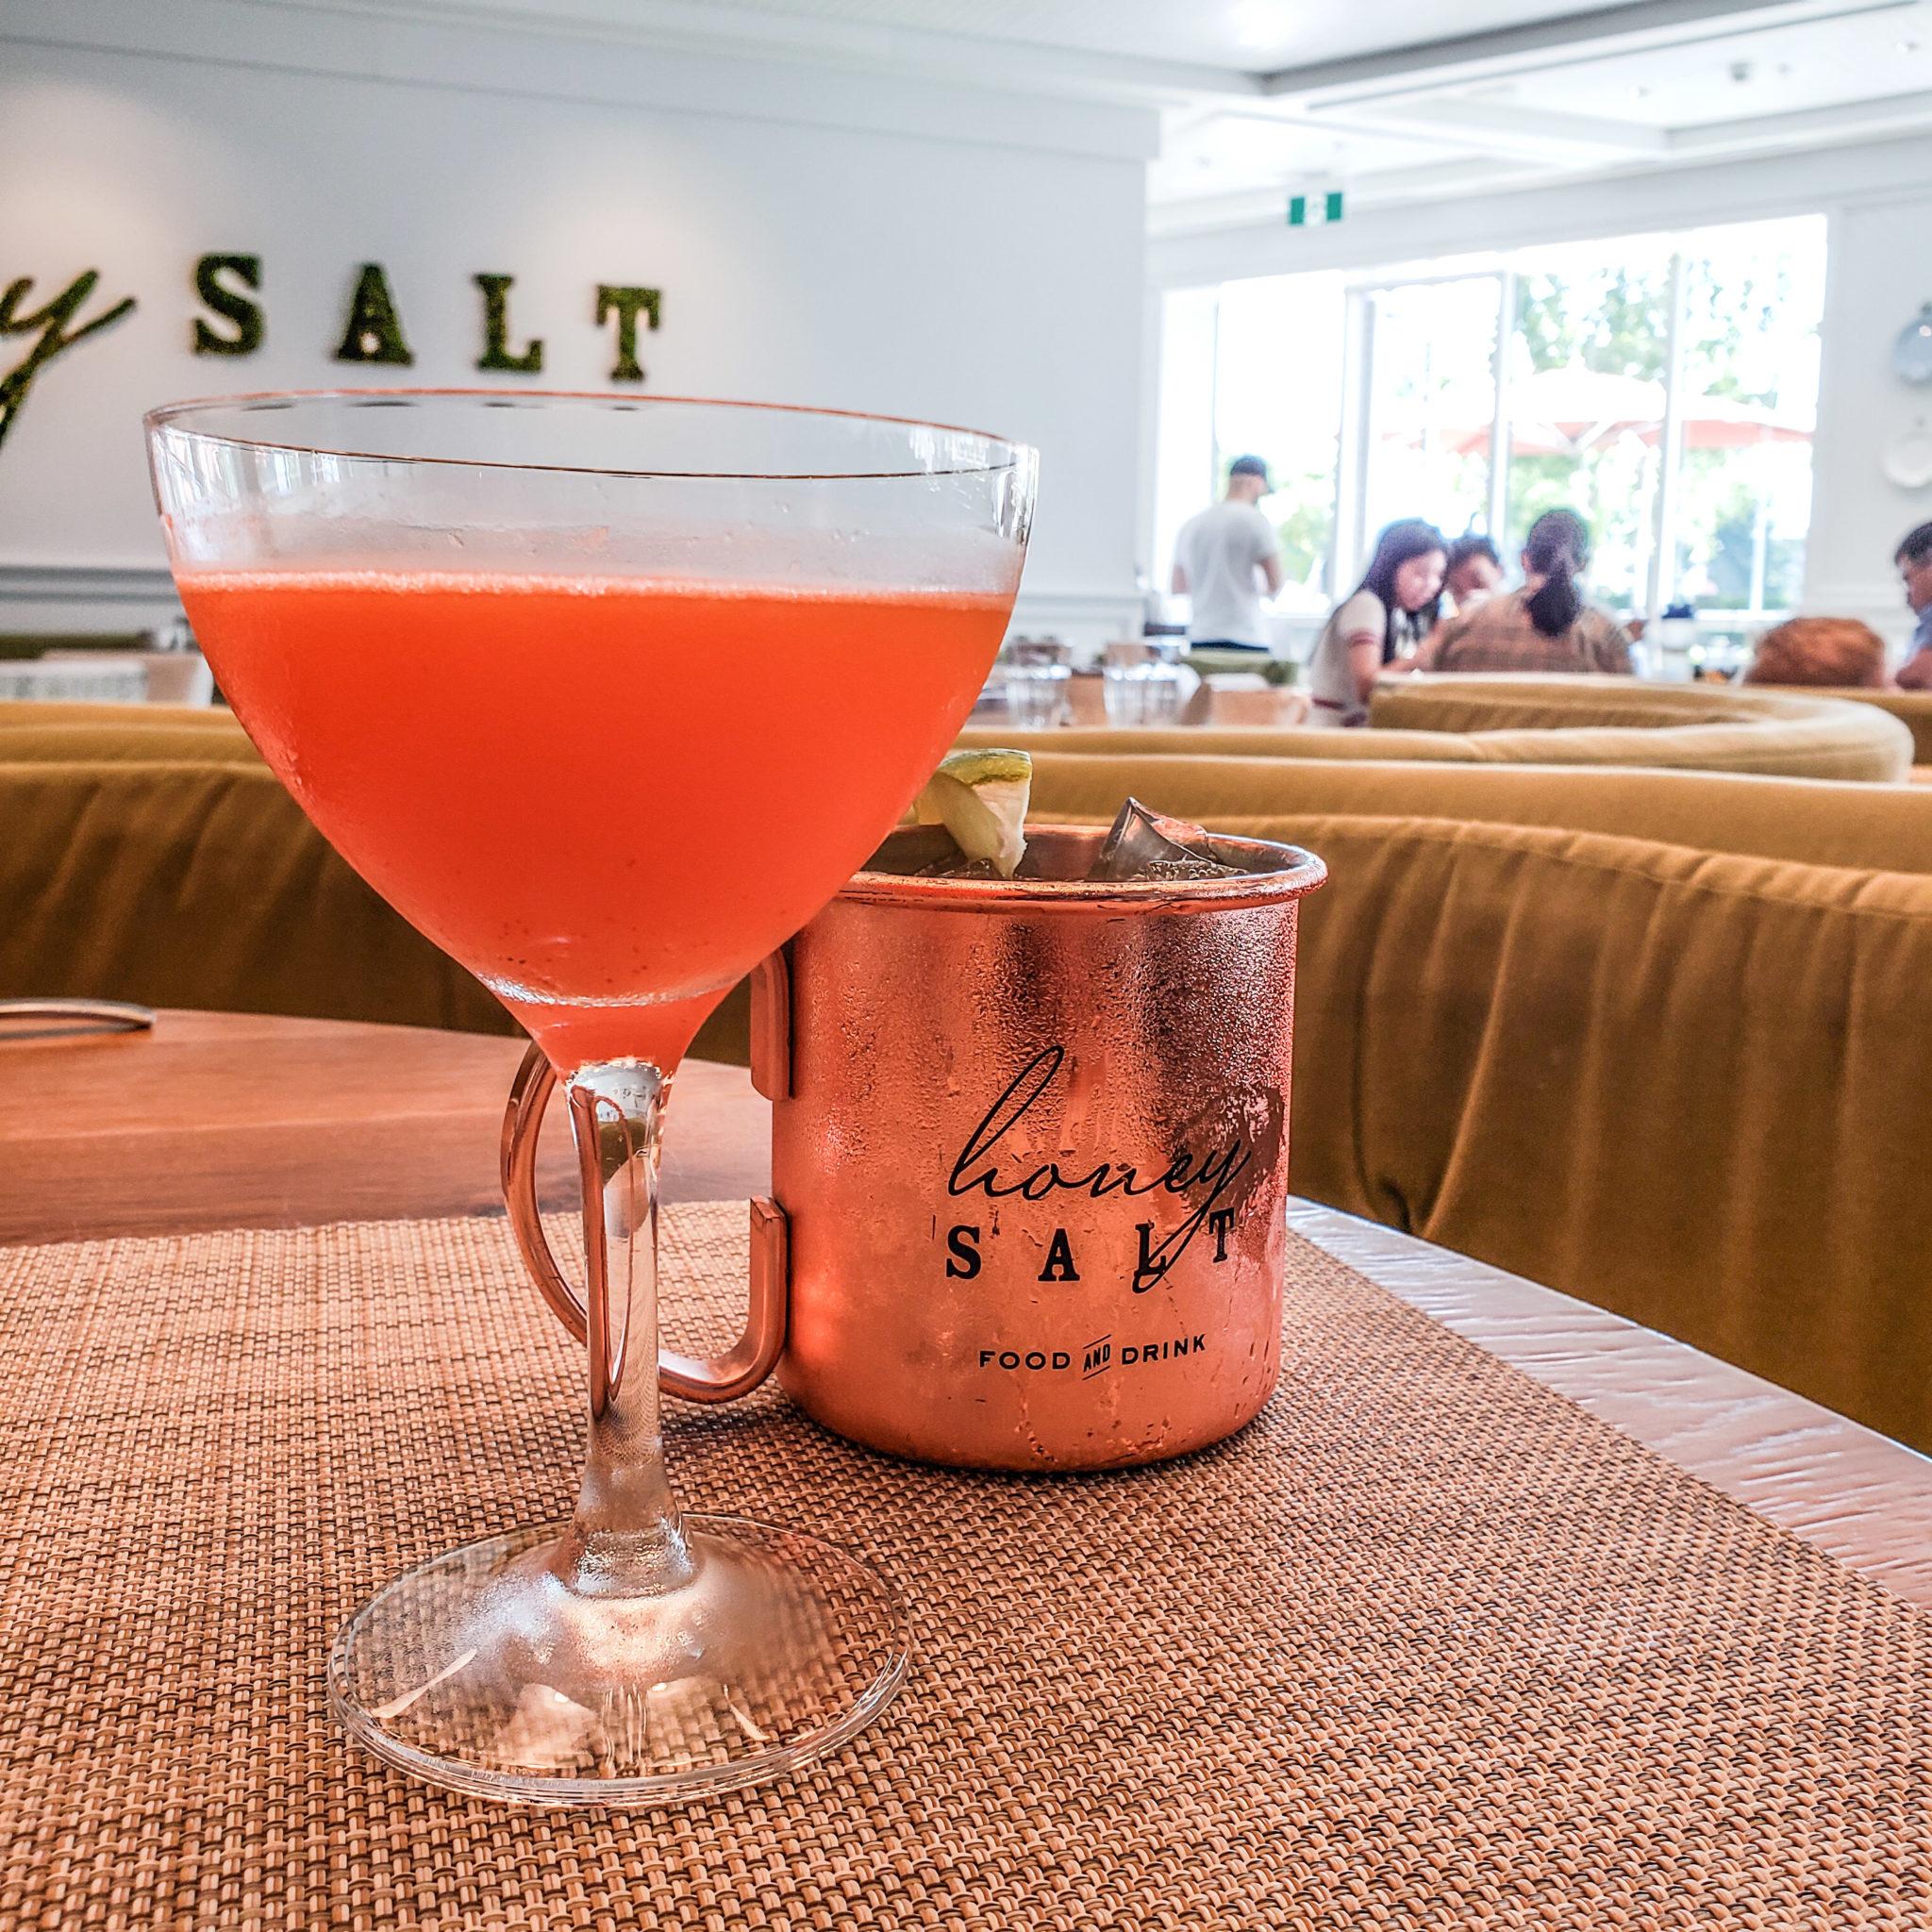 Vancouver - Canada - British Columbia - Parq Hotel - Honey Salt - Brunch - Sultan Sandur - Cocktail